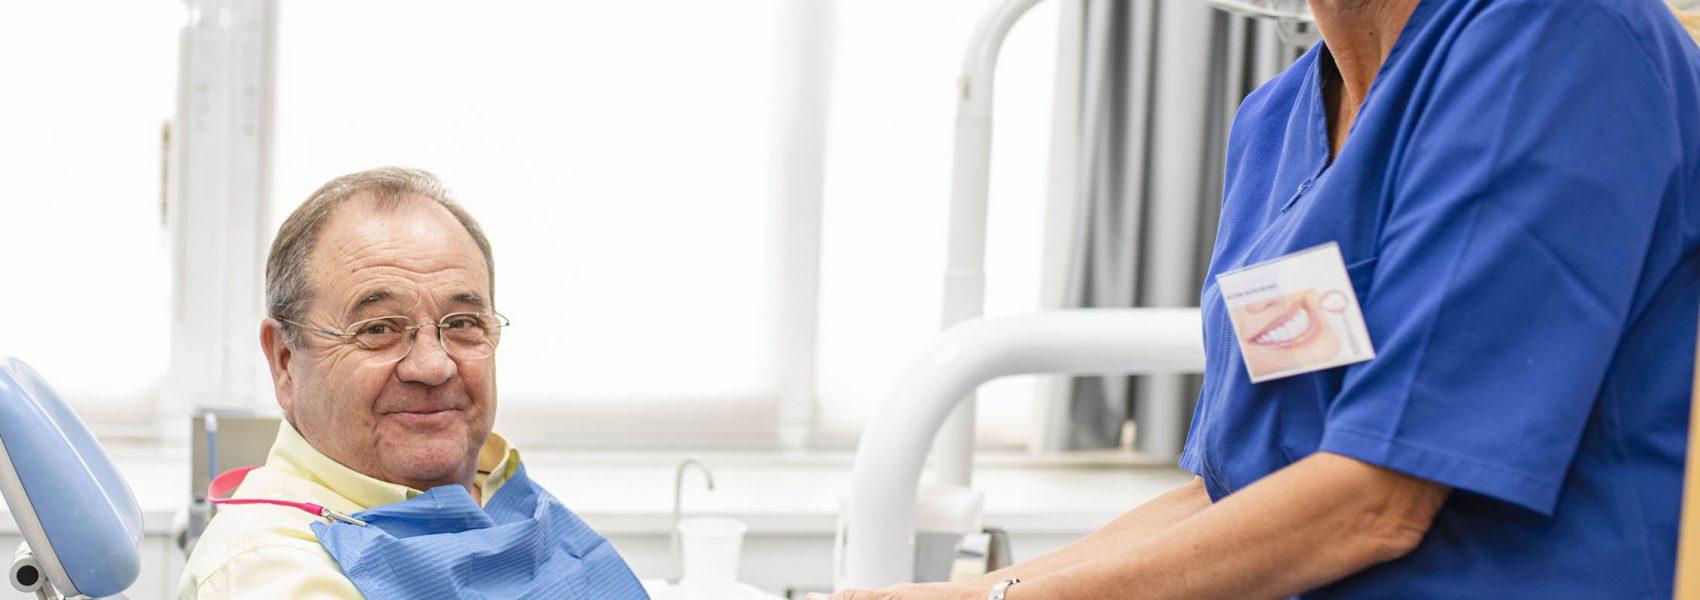 Clínica dental moncloa madrid